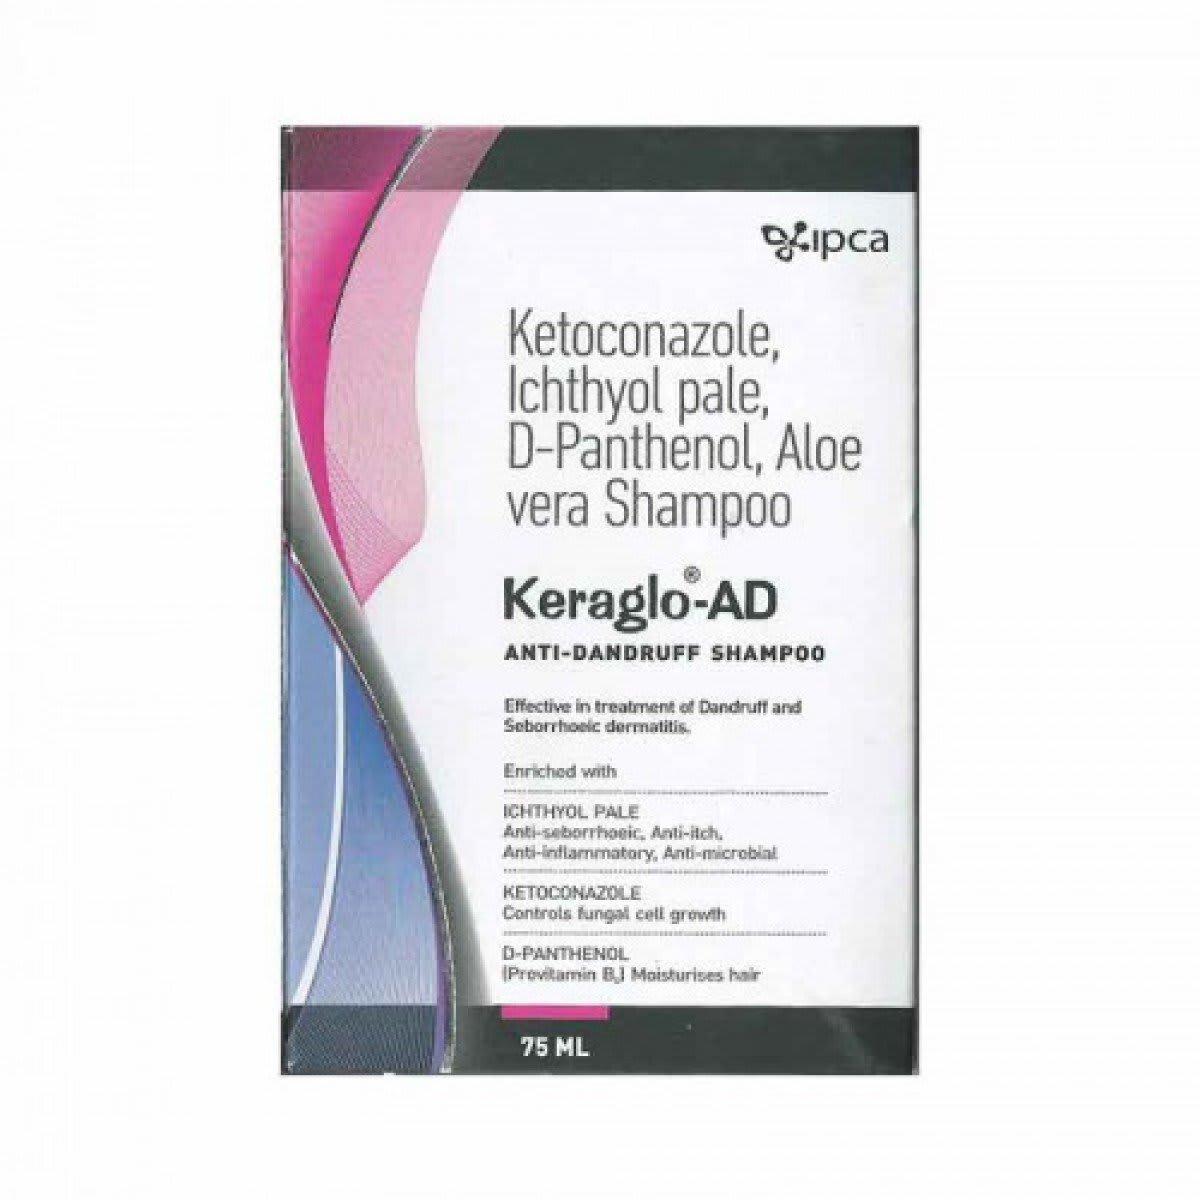 Keraglo - AD Anti-Dandruff Shampoo